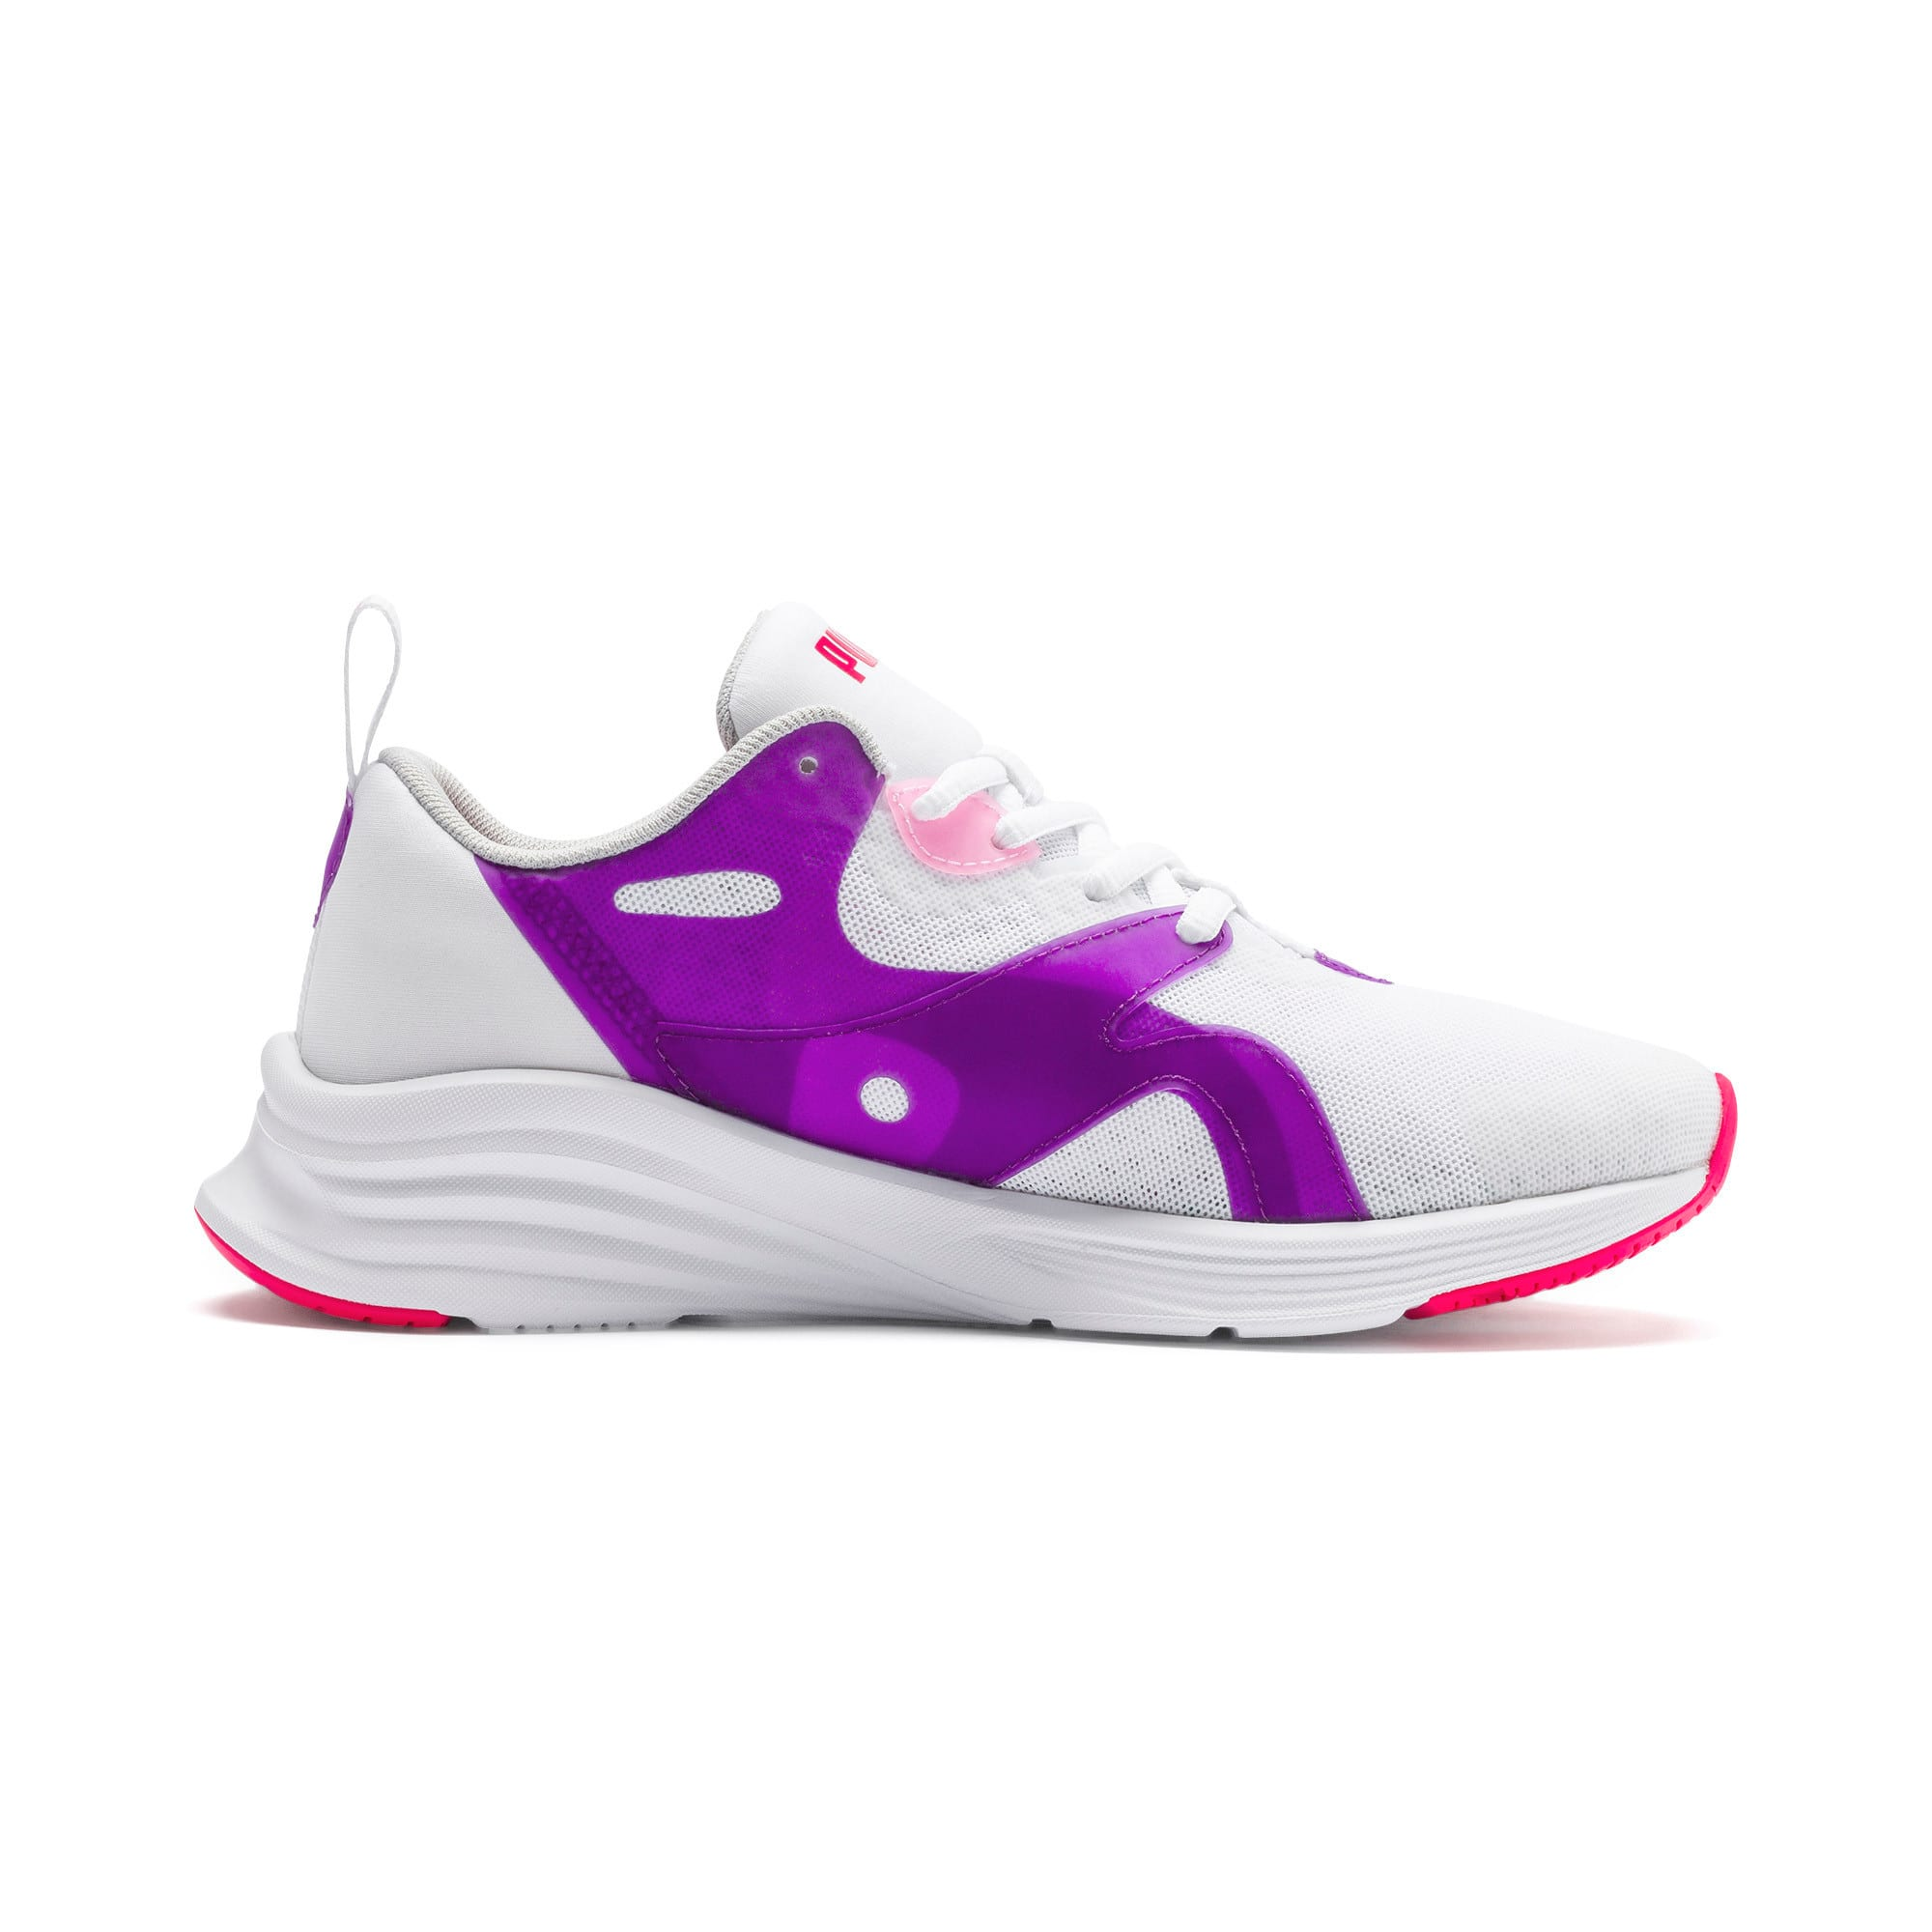 Thumbnail 5 of HYBRID Fuego Running Shoes JR, Puma White-Royal Lilac, medium